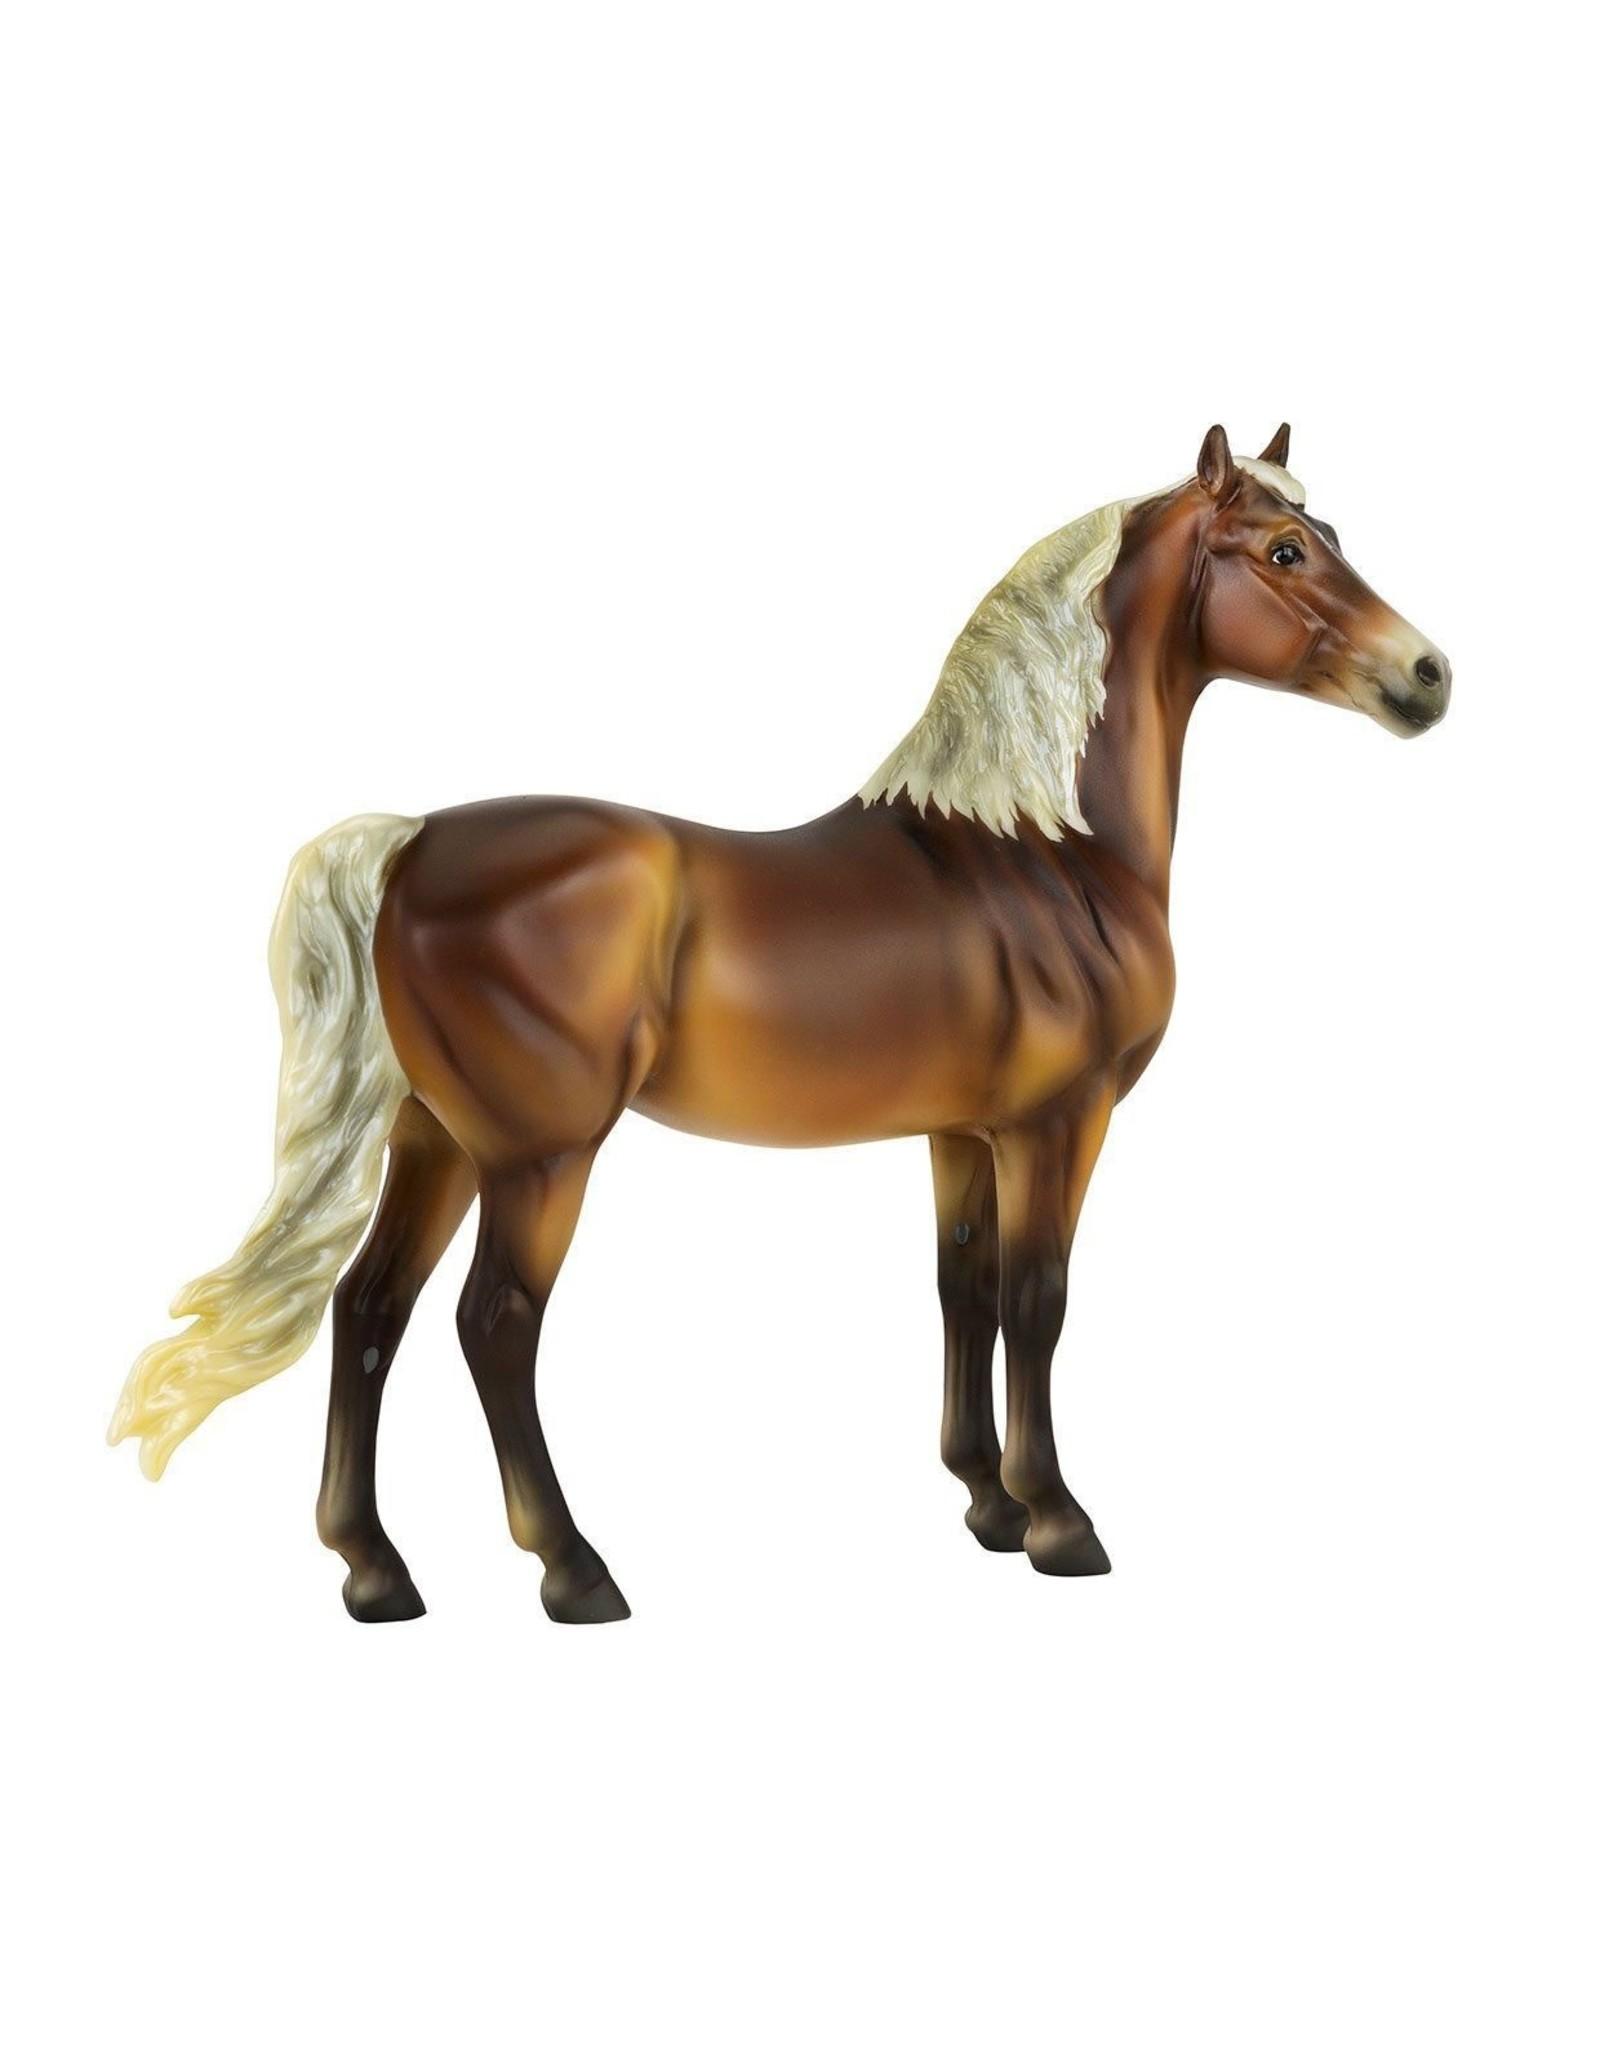 Breyer 2020 Horse of the Year - Fairfax, Morgan - NEW